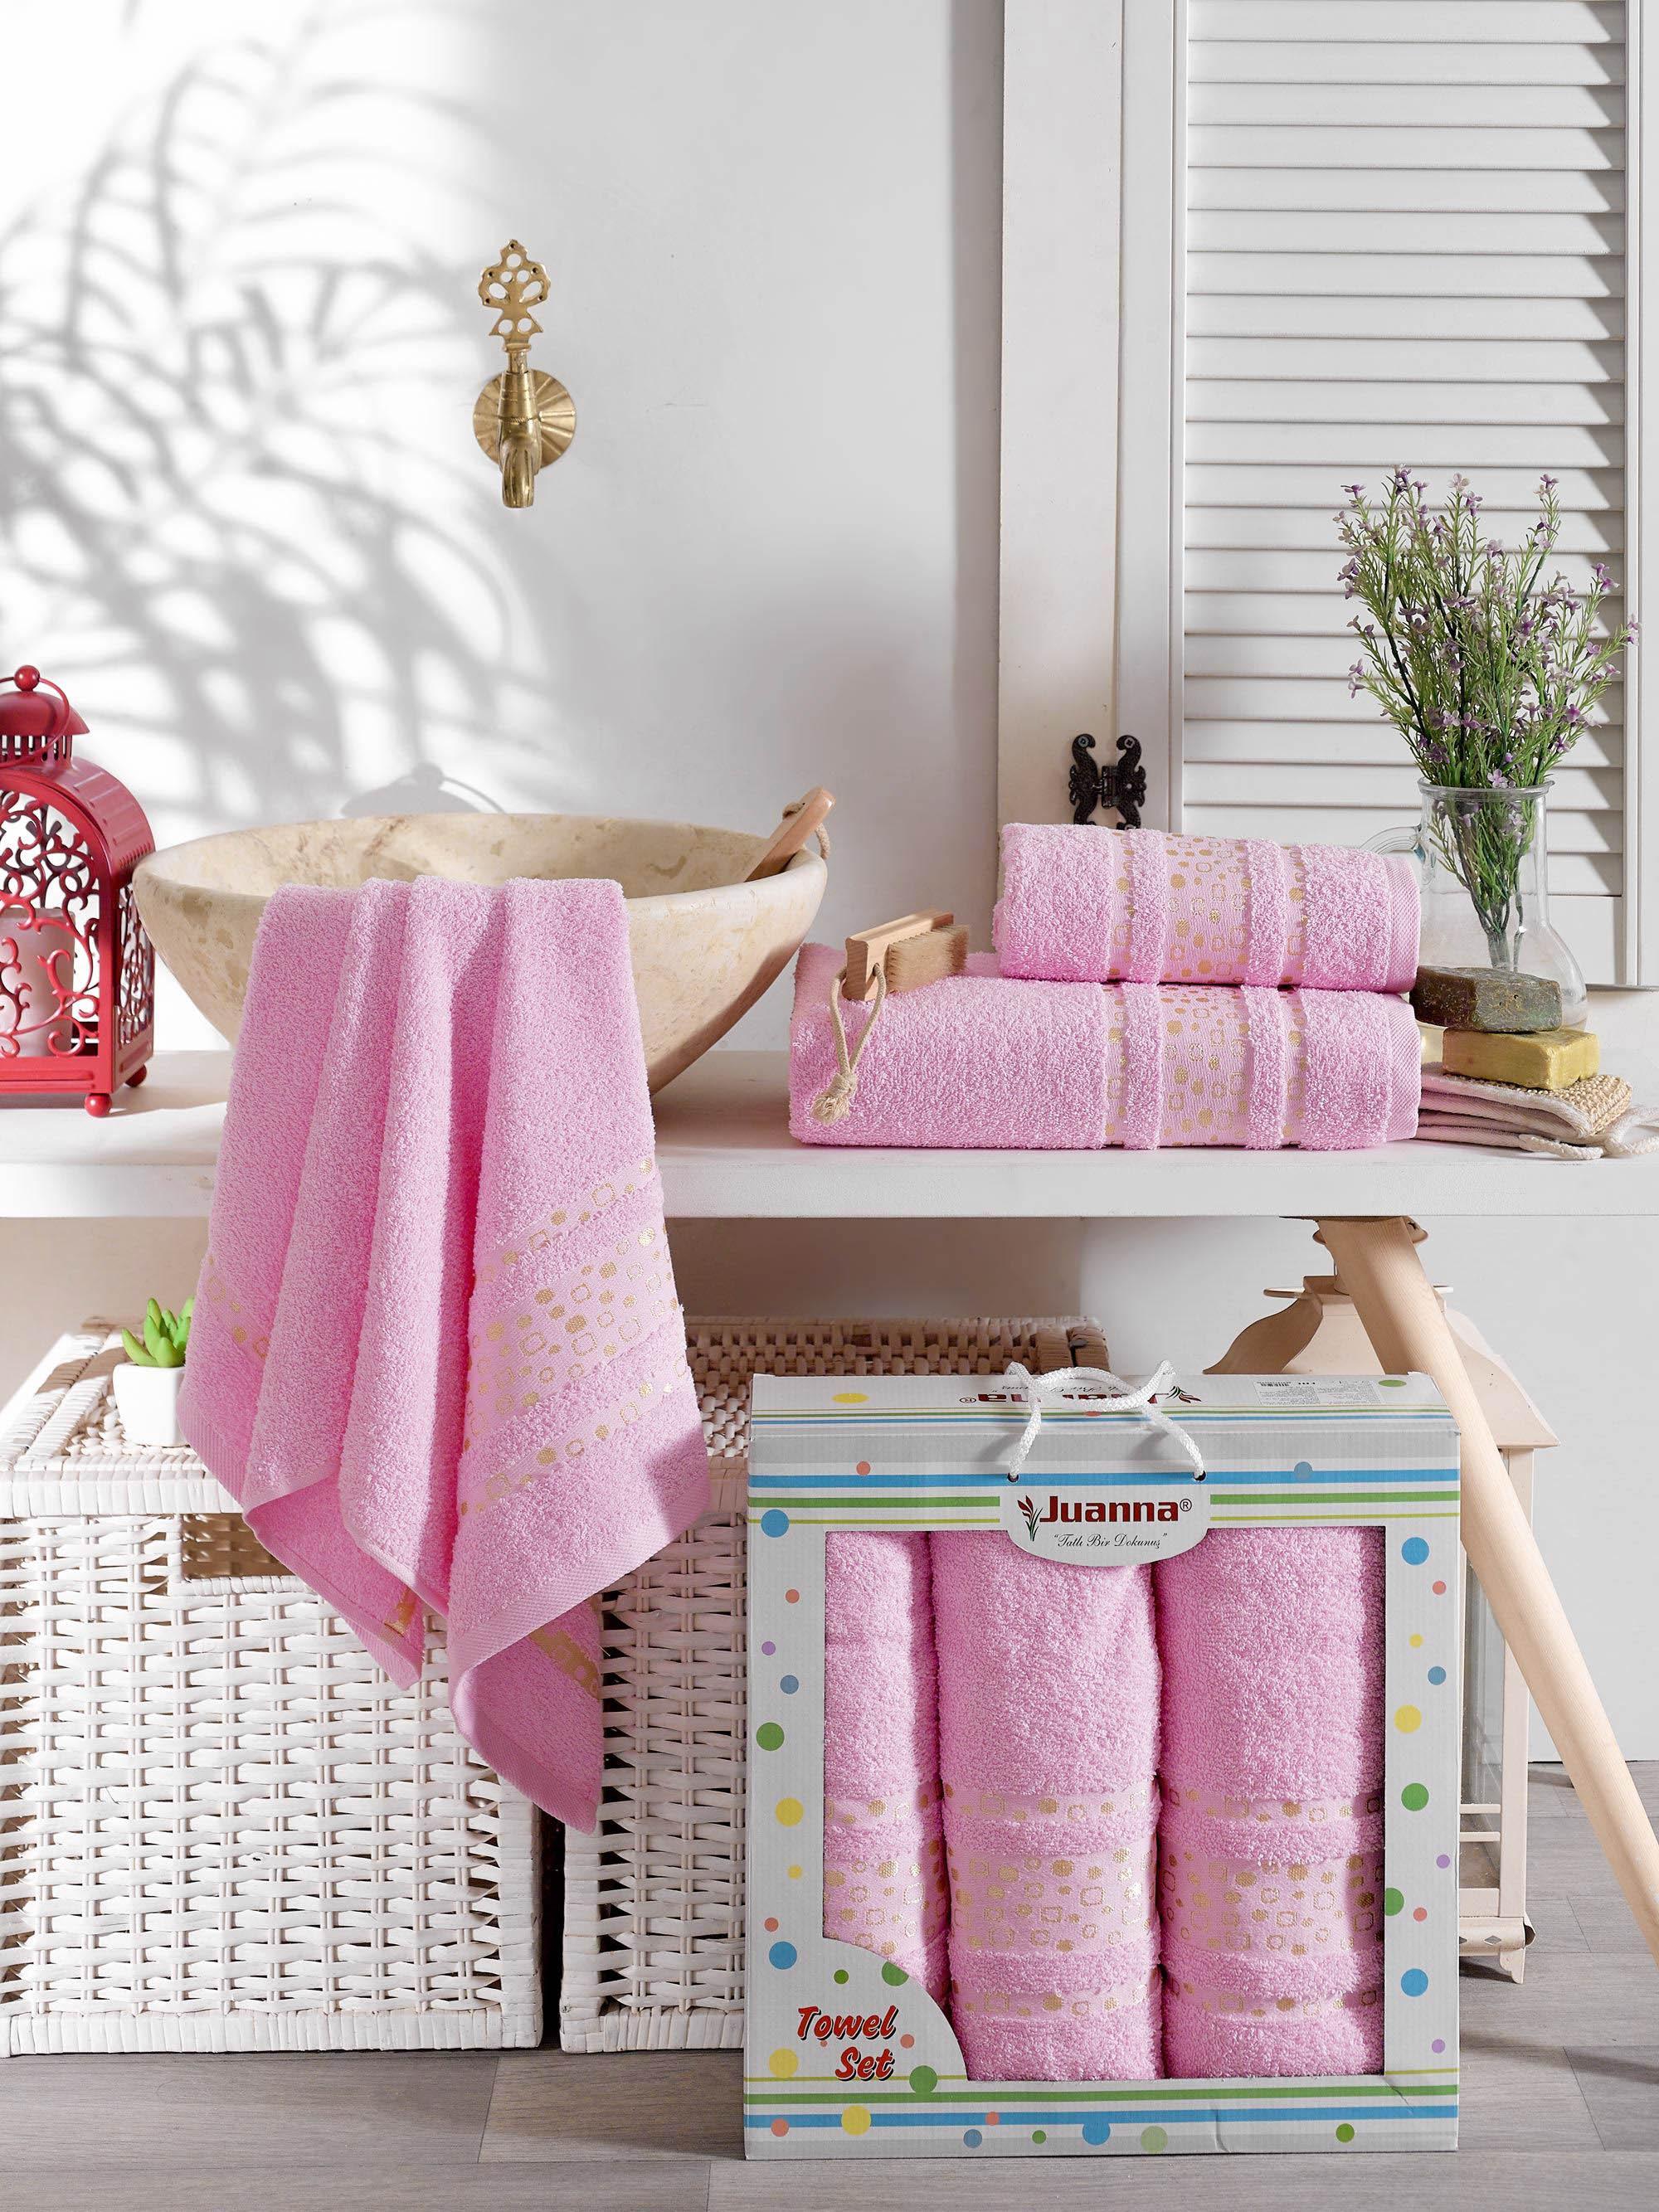 Полотенца Juanna Полотенце Puanli Цвет: Розовый (50х90 см - 2 шт,70х140 см) набор из 3 полотенец merzuka sakura 50х90 2 70х140 8432 терракотовый